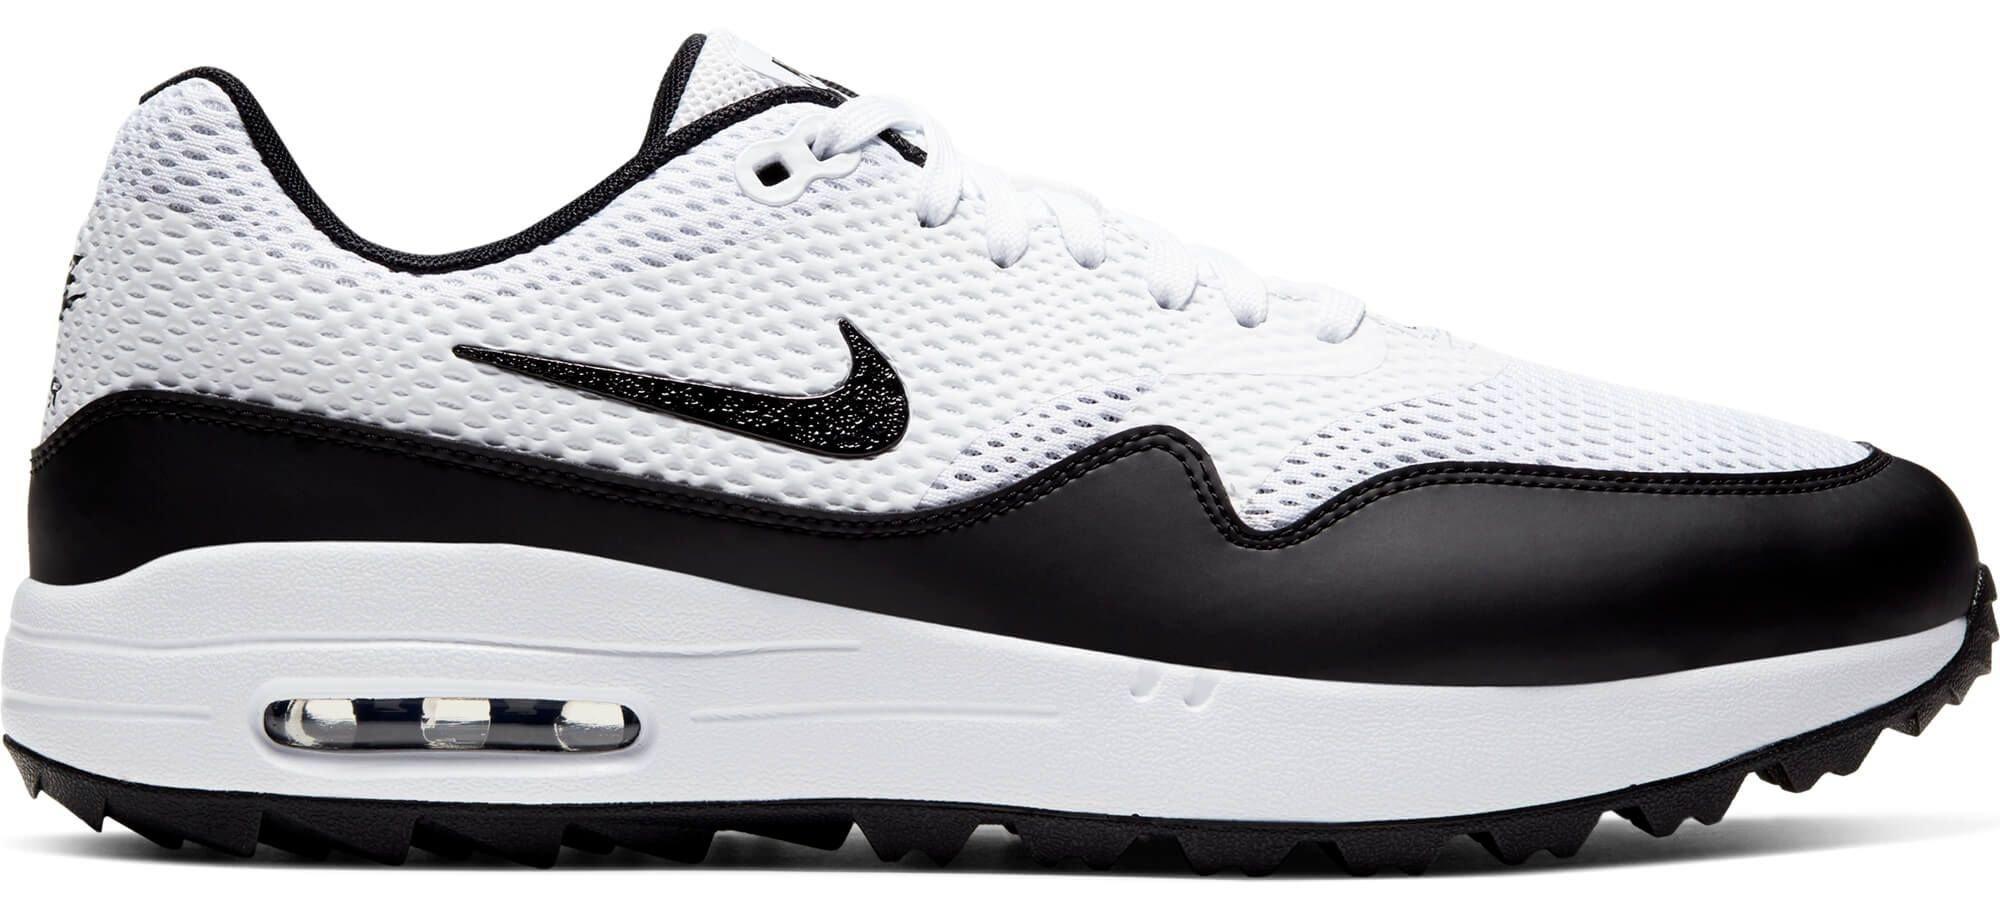 Nike Air Max 1 G Golf Shoes 2020 White Black Carl S Golfland